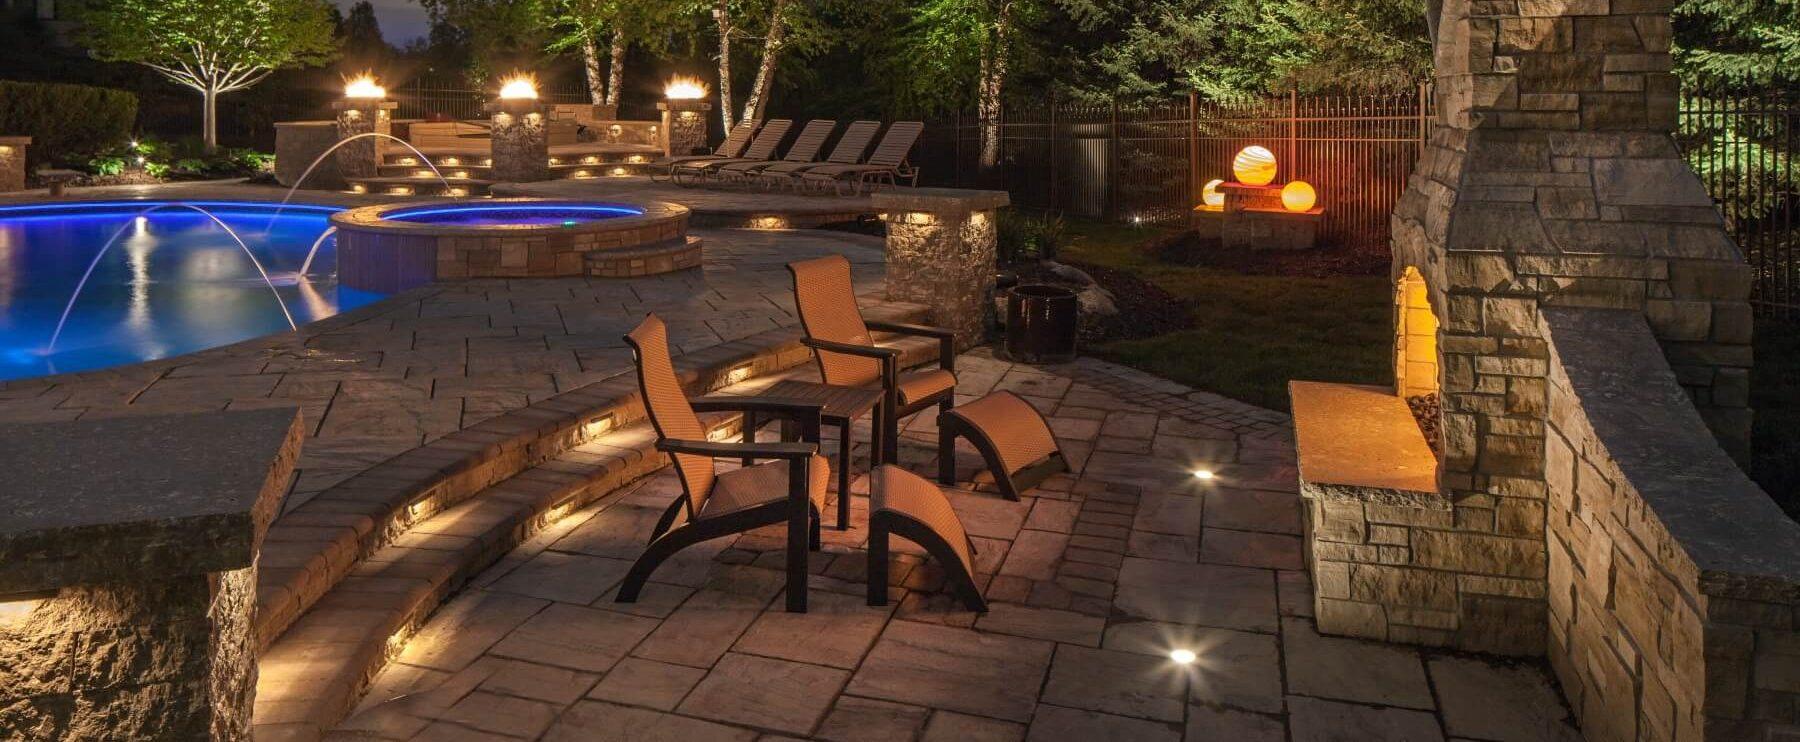 Outdoor Lighting Ideas Inspiration Mckay Landscape & Mckays Outdoor Furniture - Furniture Ideas